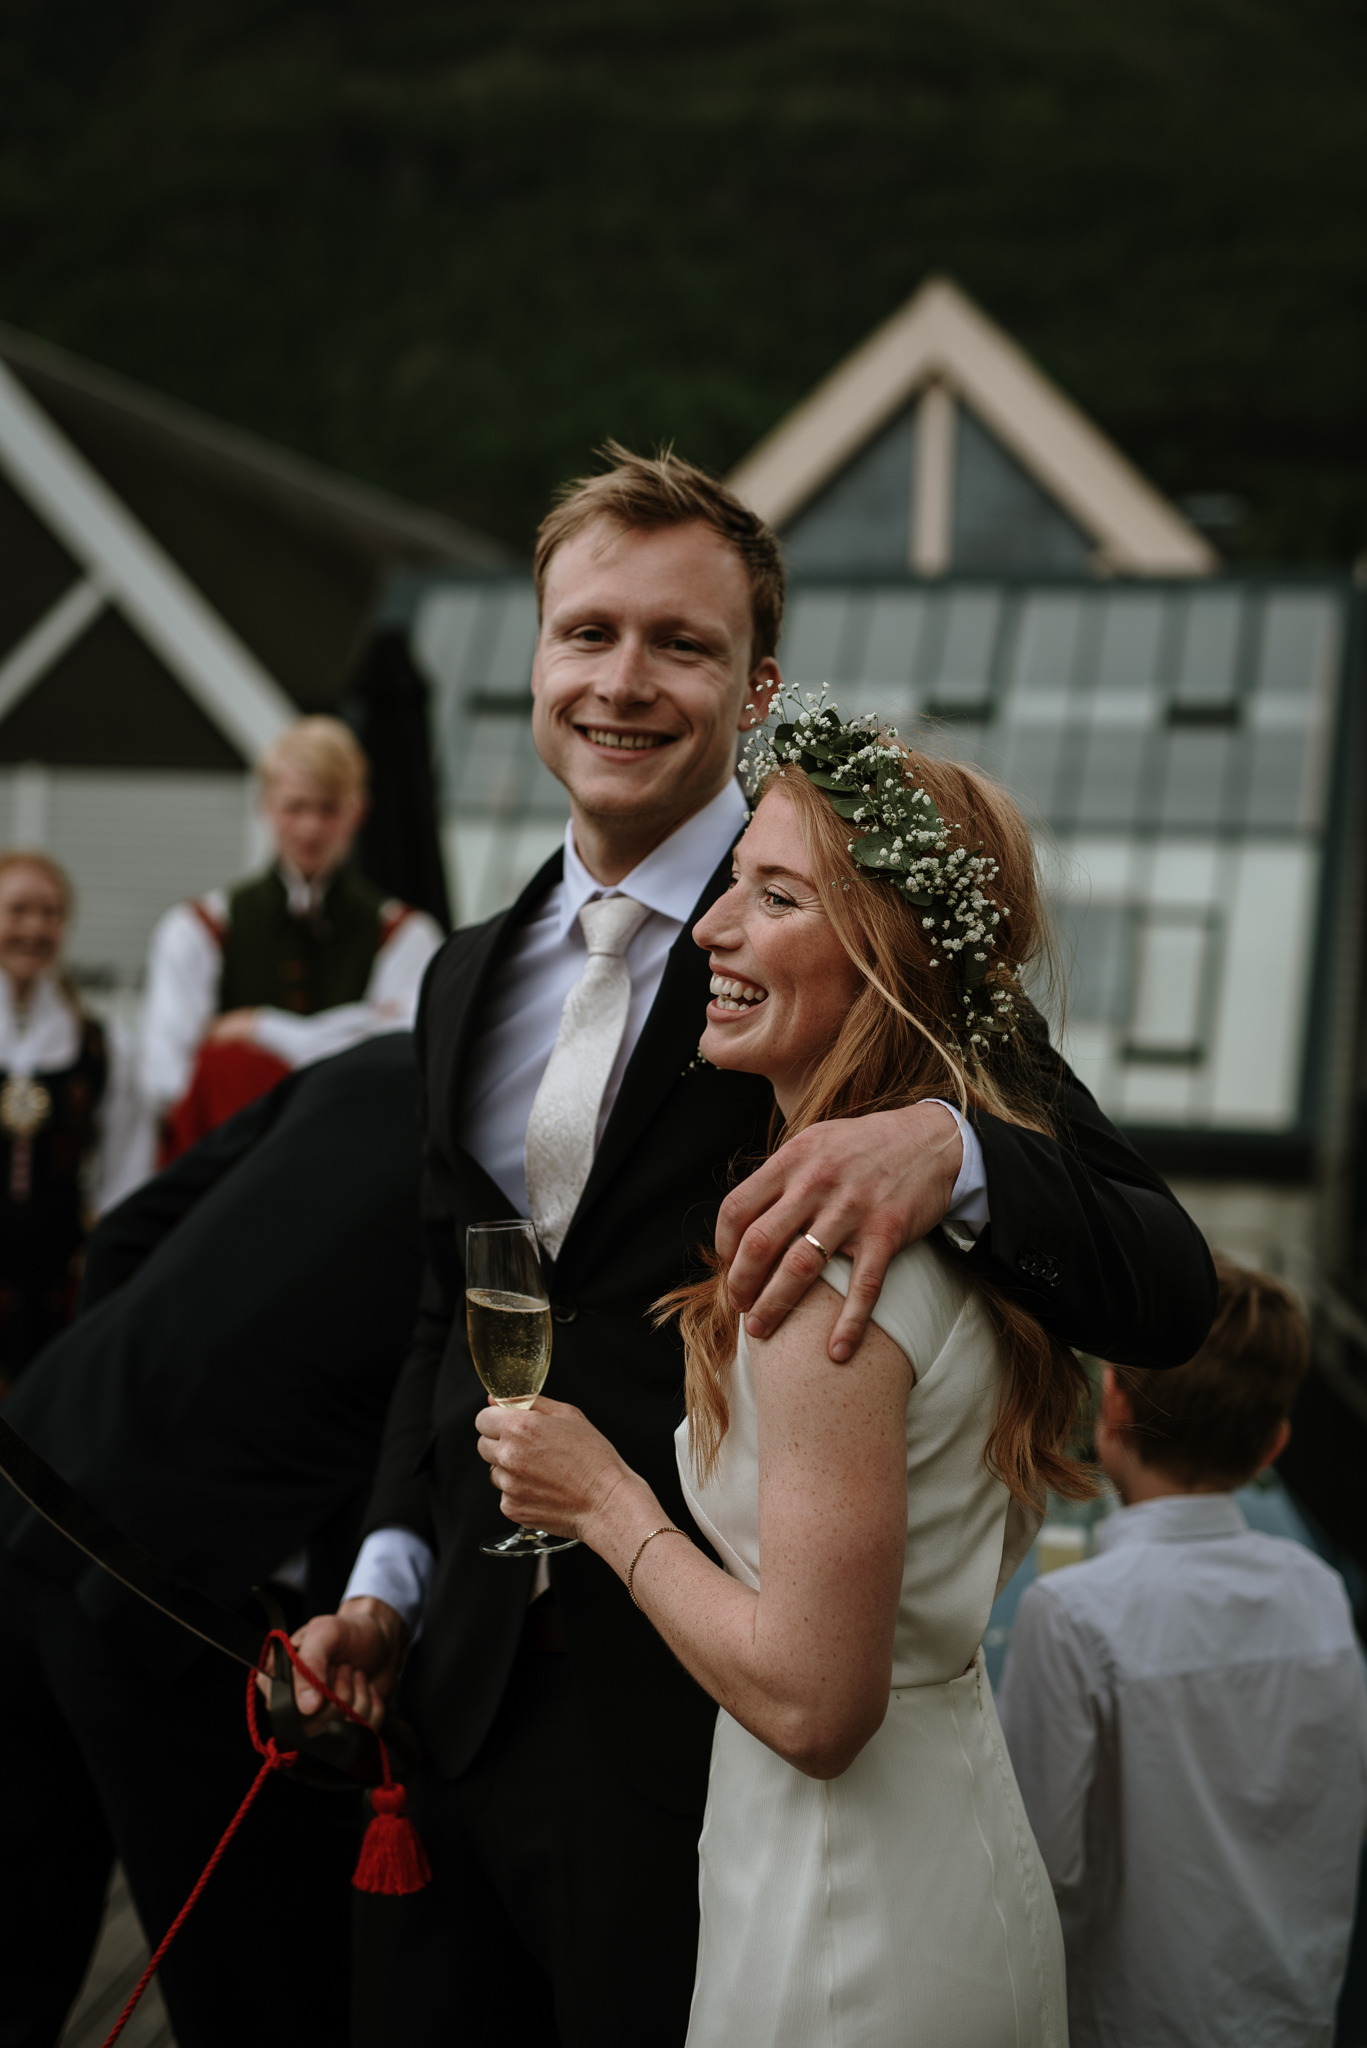 Bryllupsfotograf Sogndal - bryllup Skjolden Hotell_-52.jpg